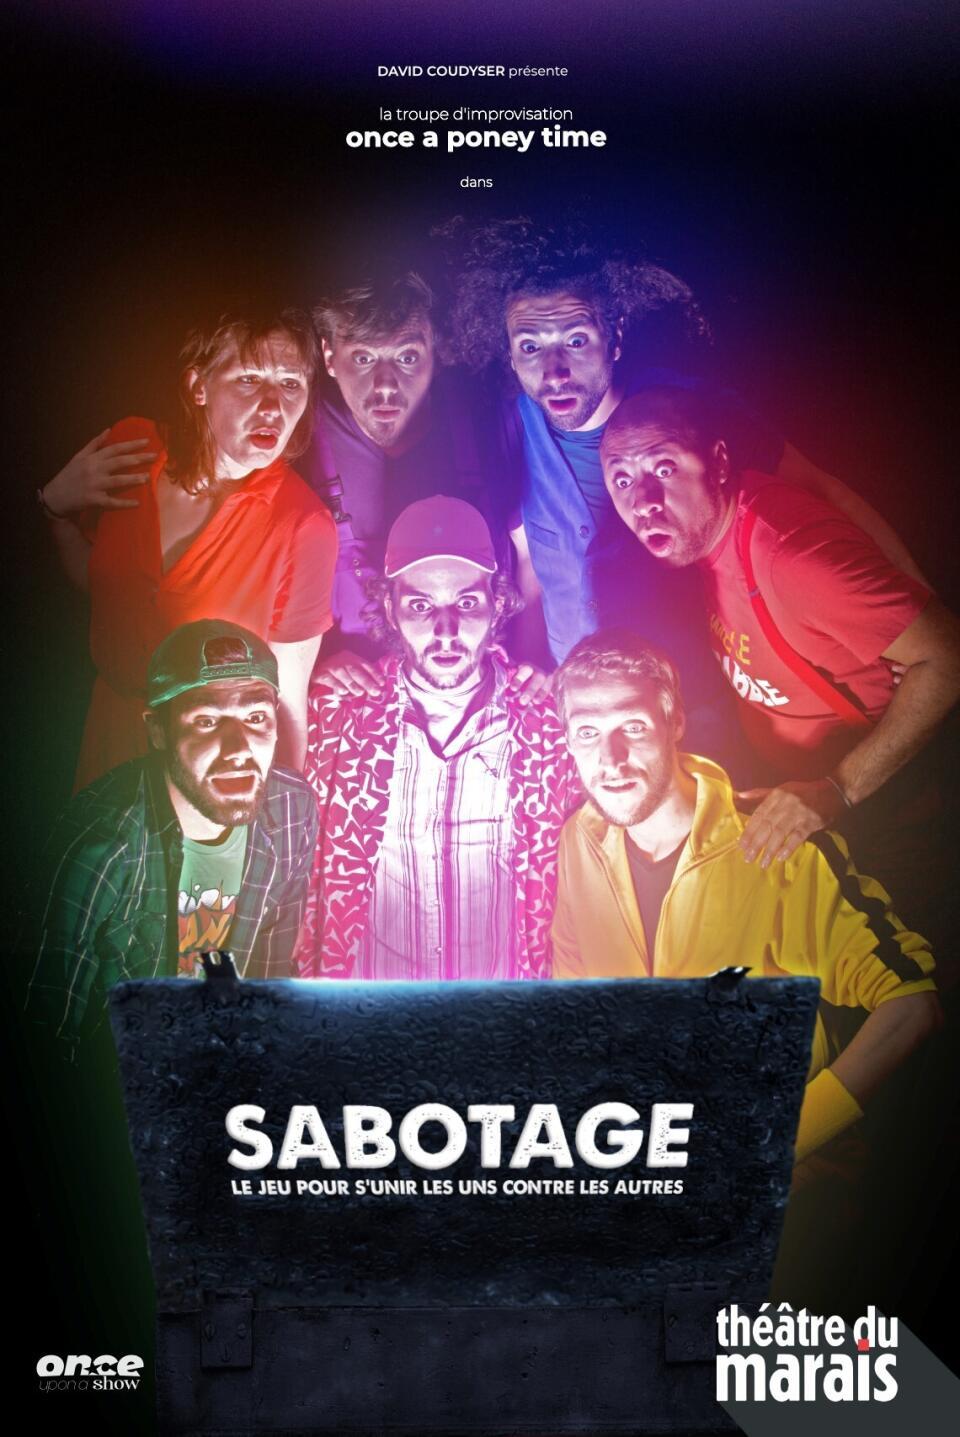 sabotage_1622042301